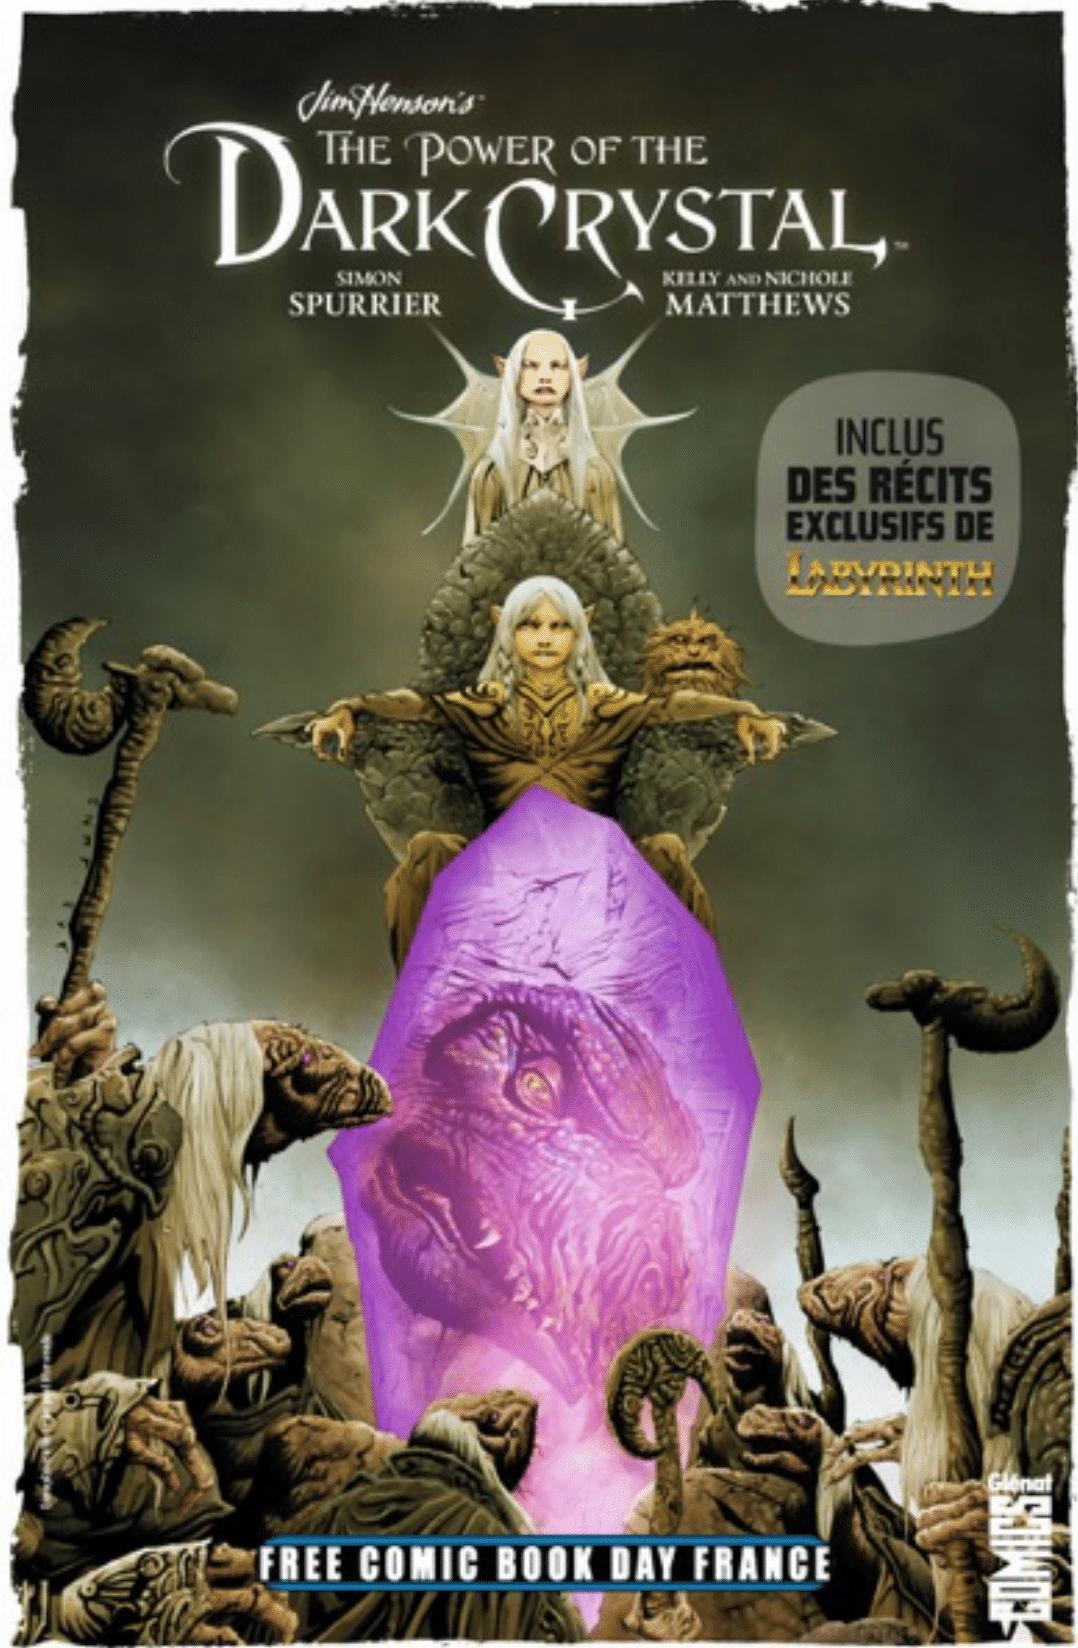 Free Comic Book Day France 2019 – Glénat Comics – Le Pouvoir du Dark Crystal